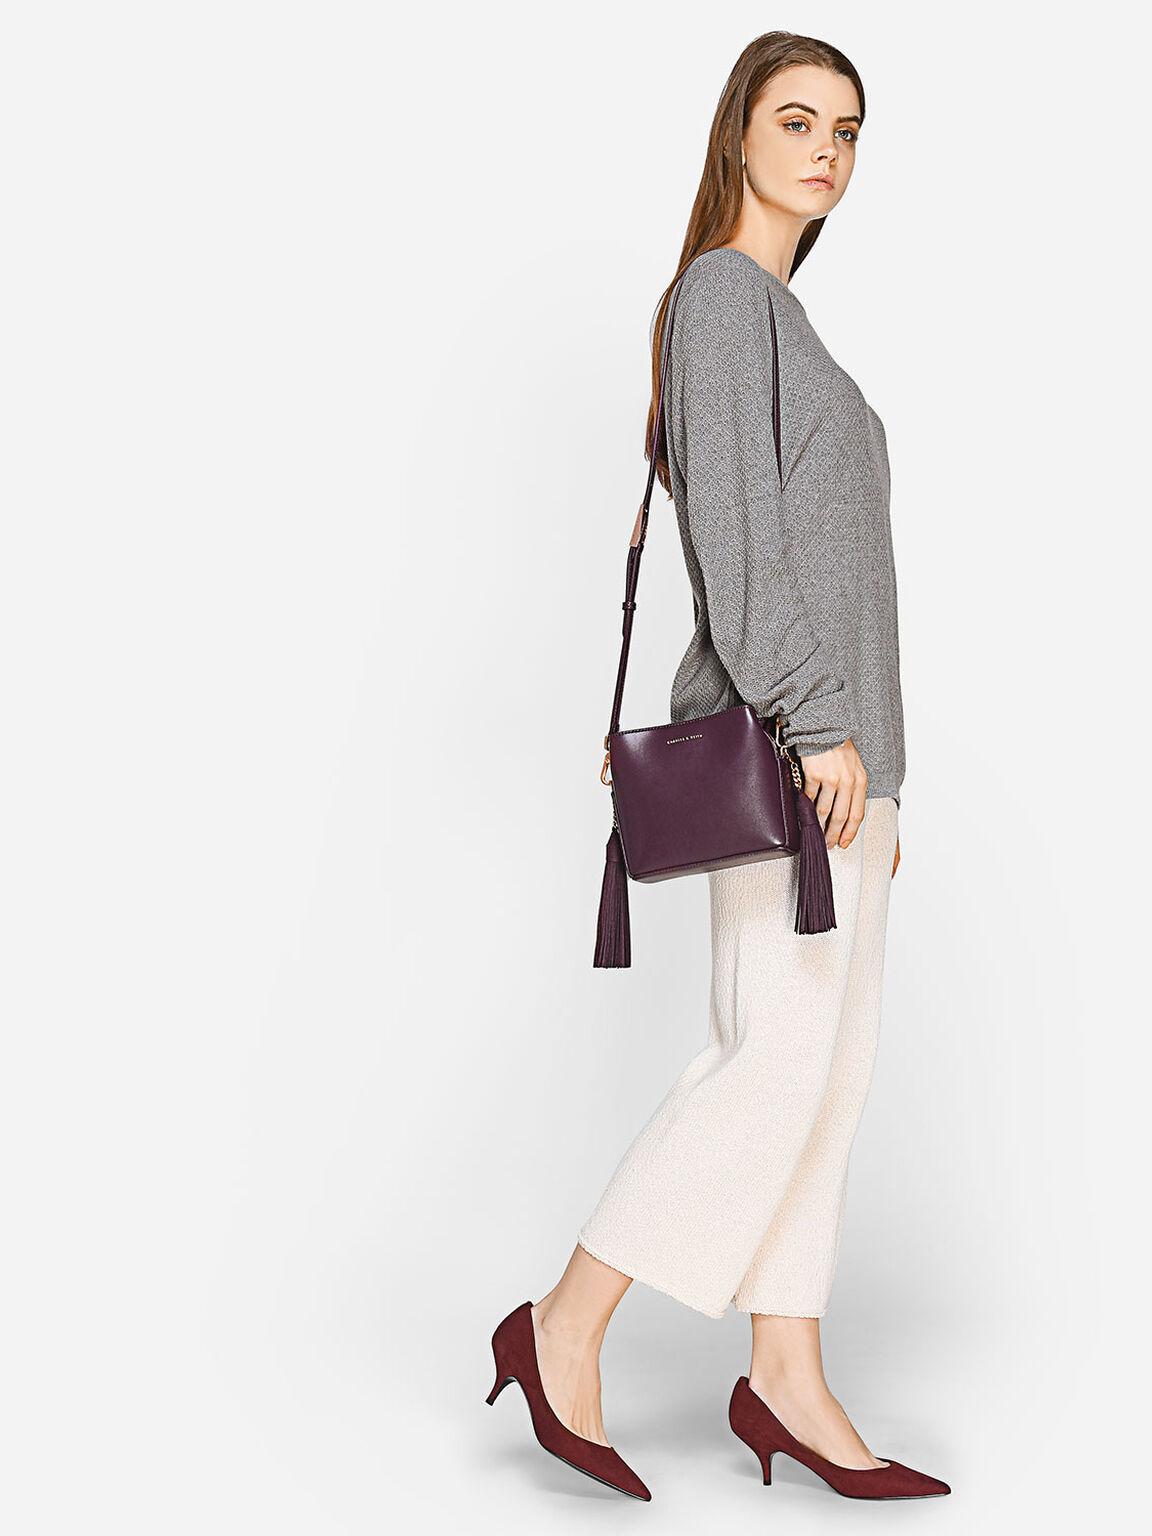 Tassel Sling Bag, Prune, hi-res